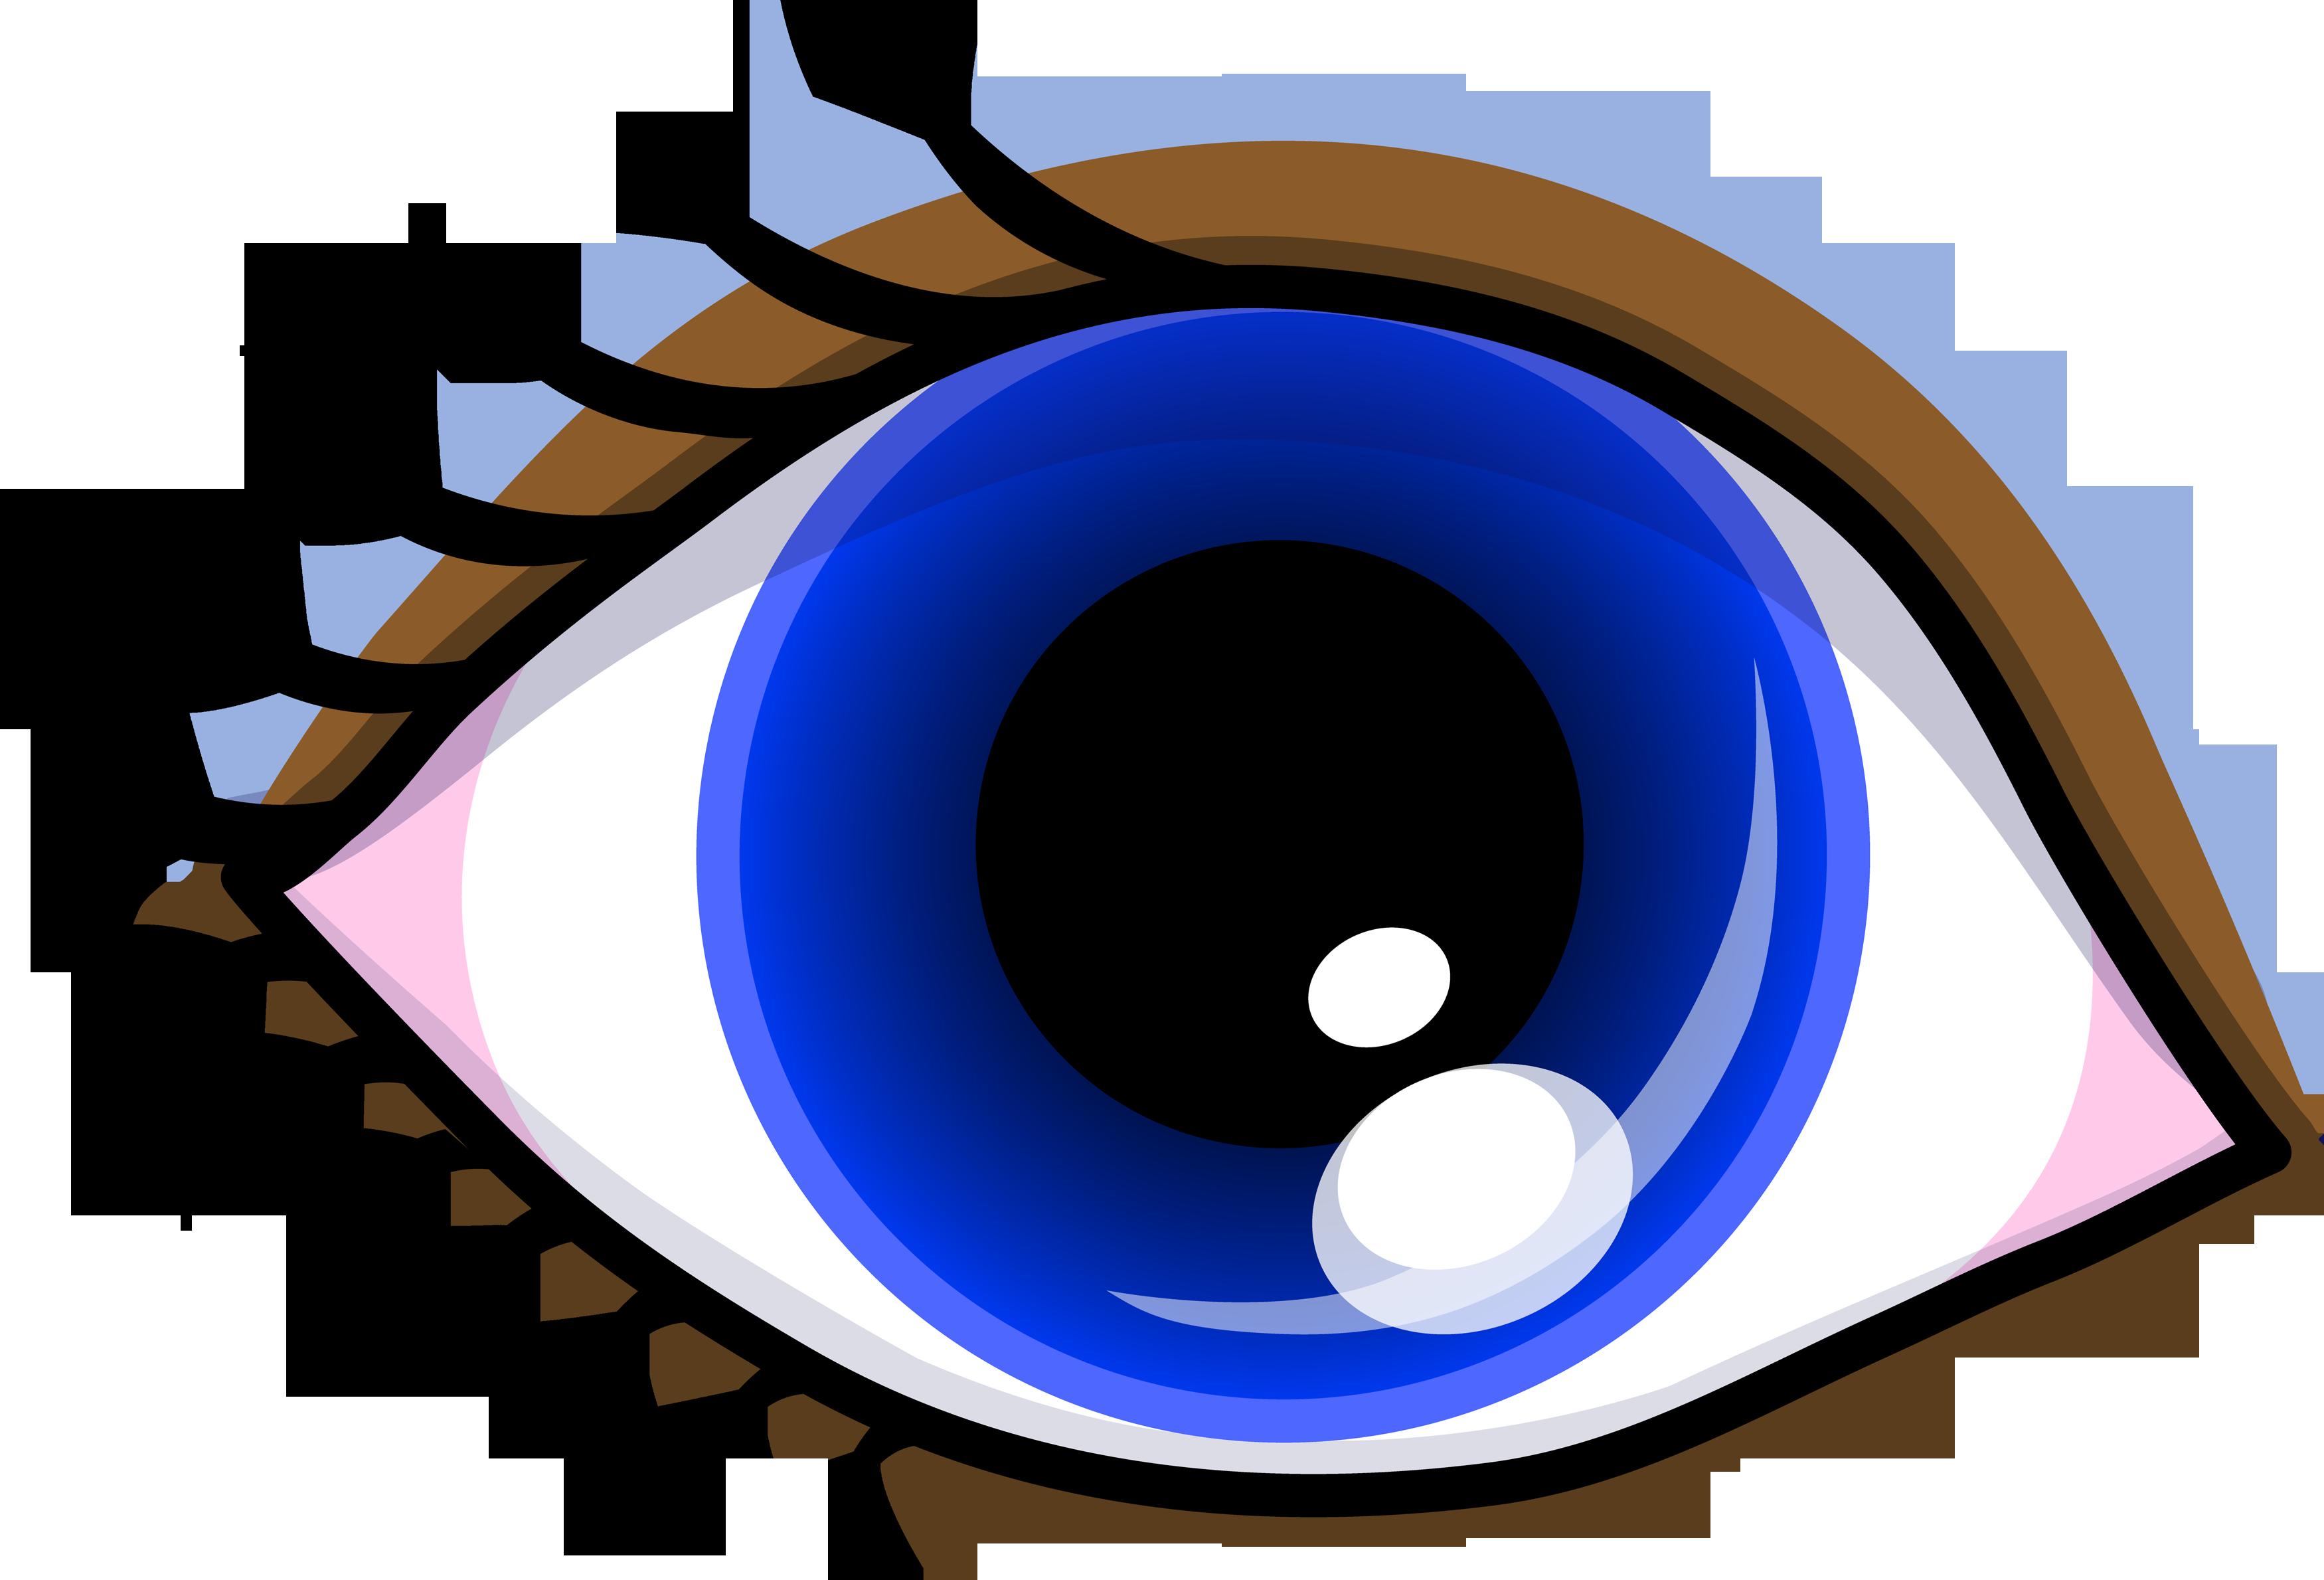 eye clipart - Blue Eyes Clipart